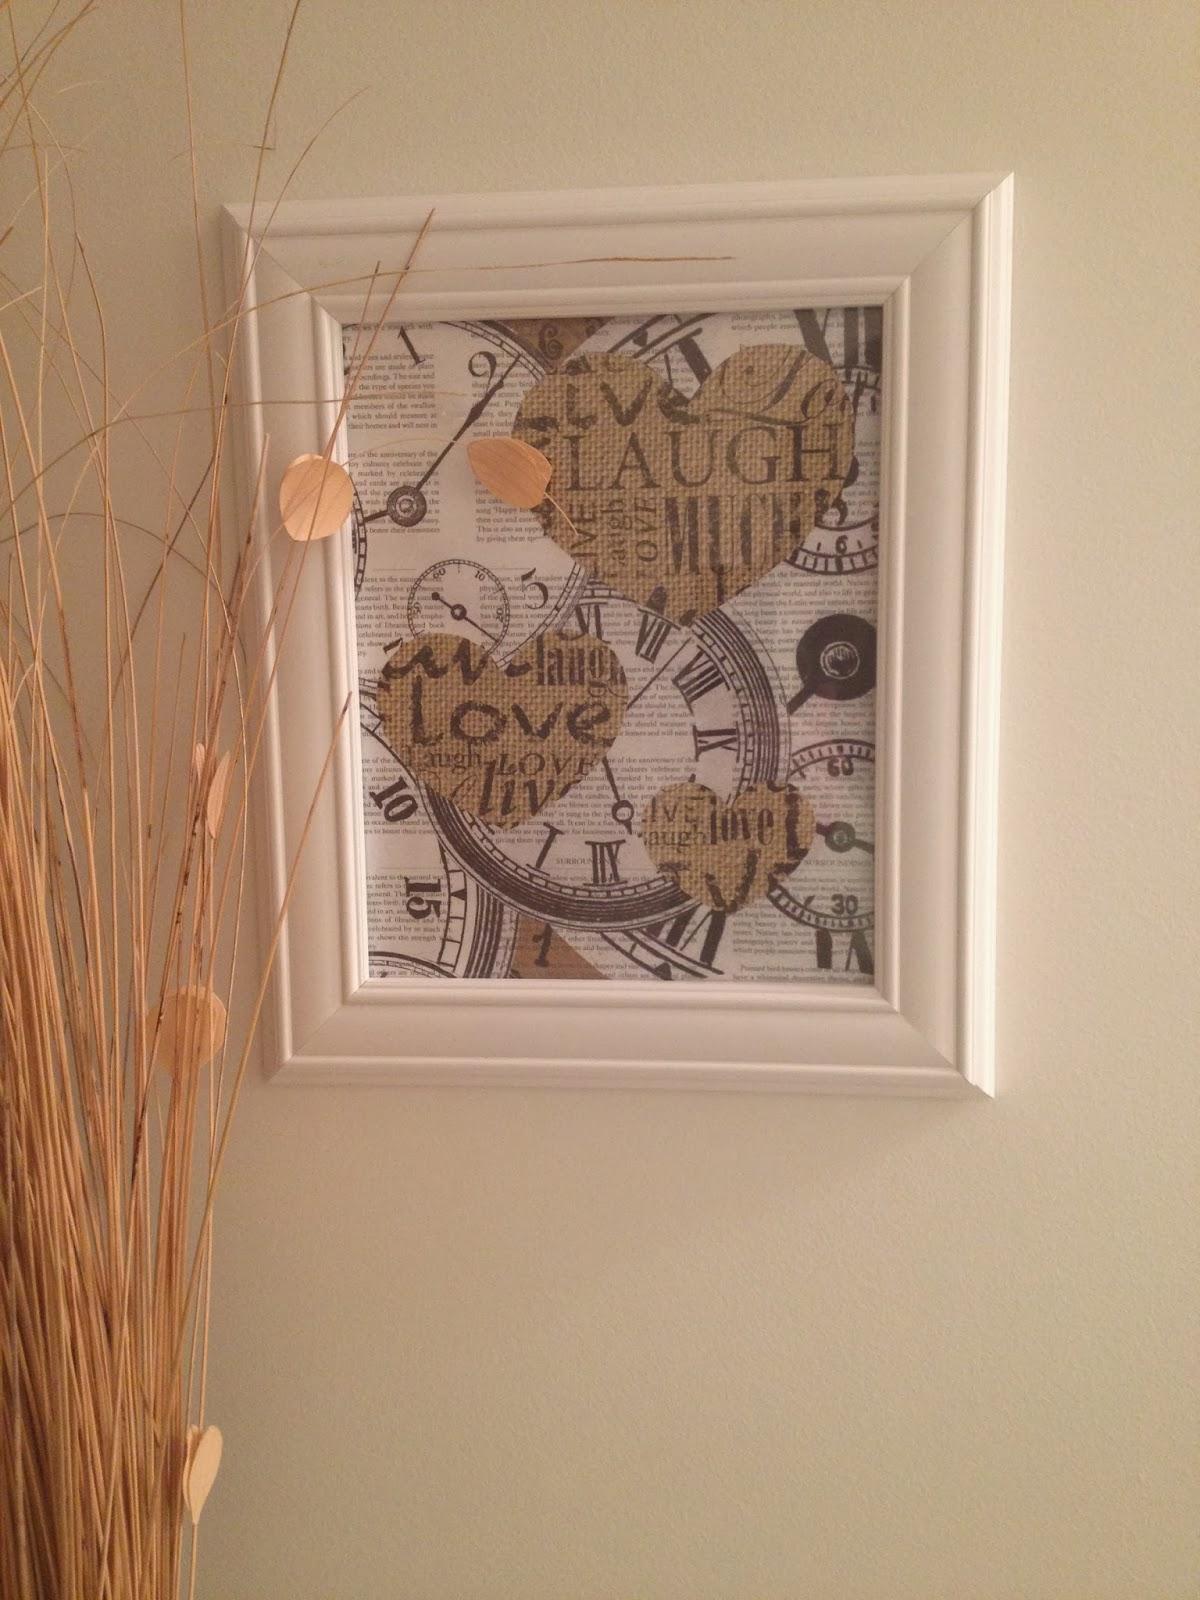 Diy Wall Art Using Scrapbook Paper : Diy wall decor scrapbook paper imgkid the